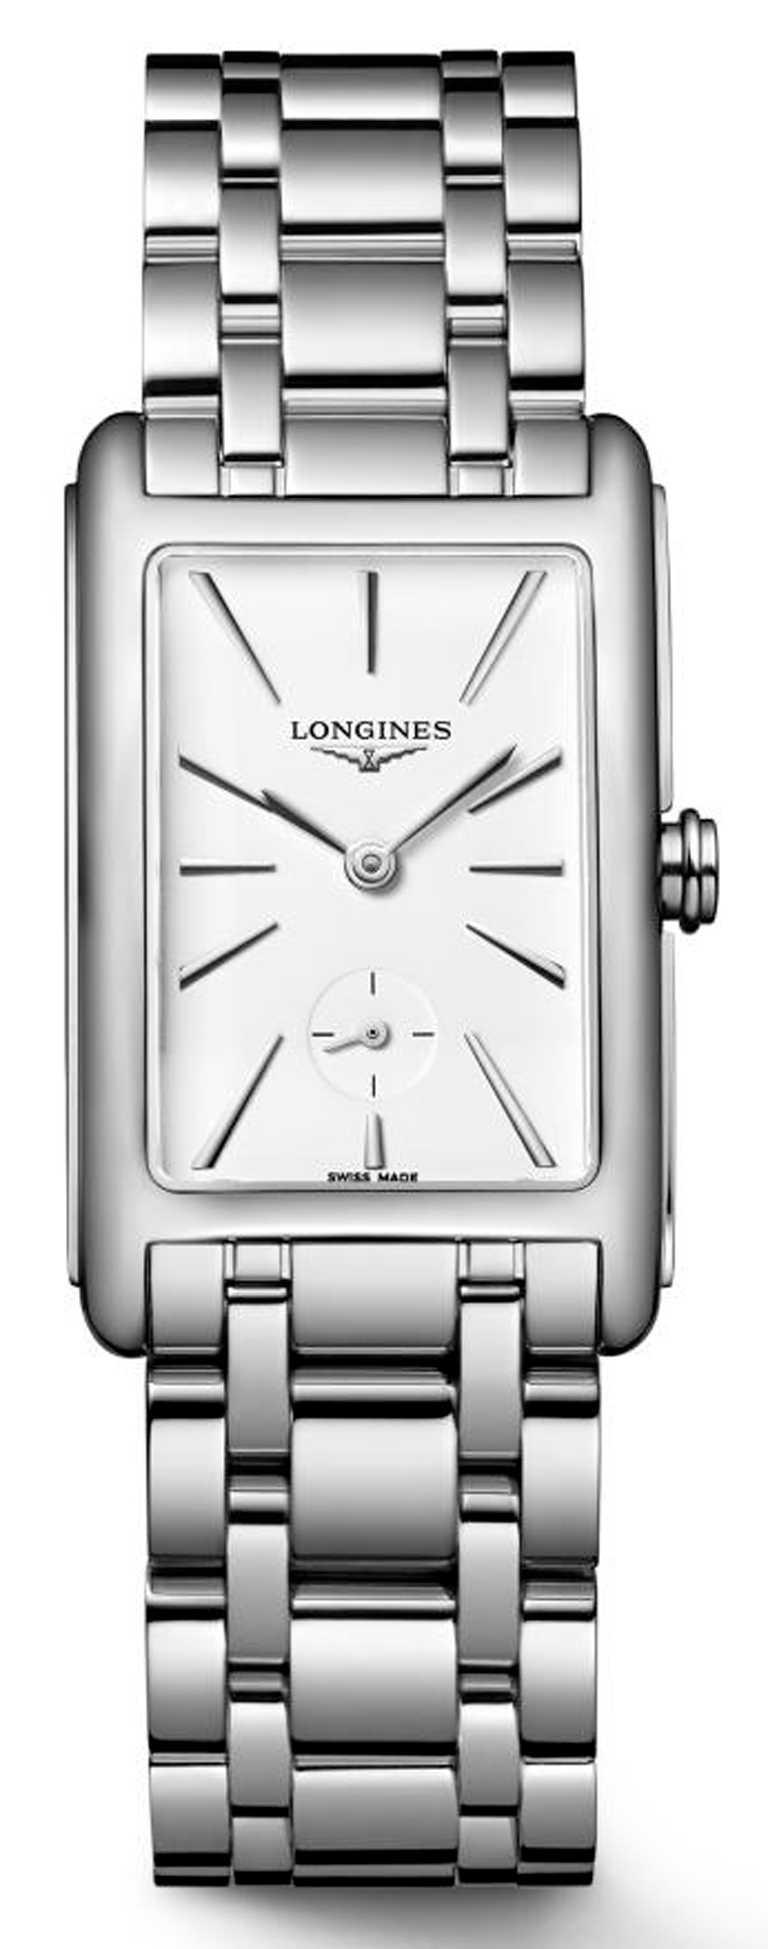 LONGINES「DolceVita多情」系列,白色面盤女士腕錶,不鏽鋼錶殼、錶帶,23.3 x37mm,石英機芯╱41,500元。(圖╱LONGINES提供)